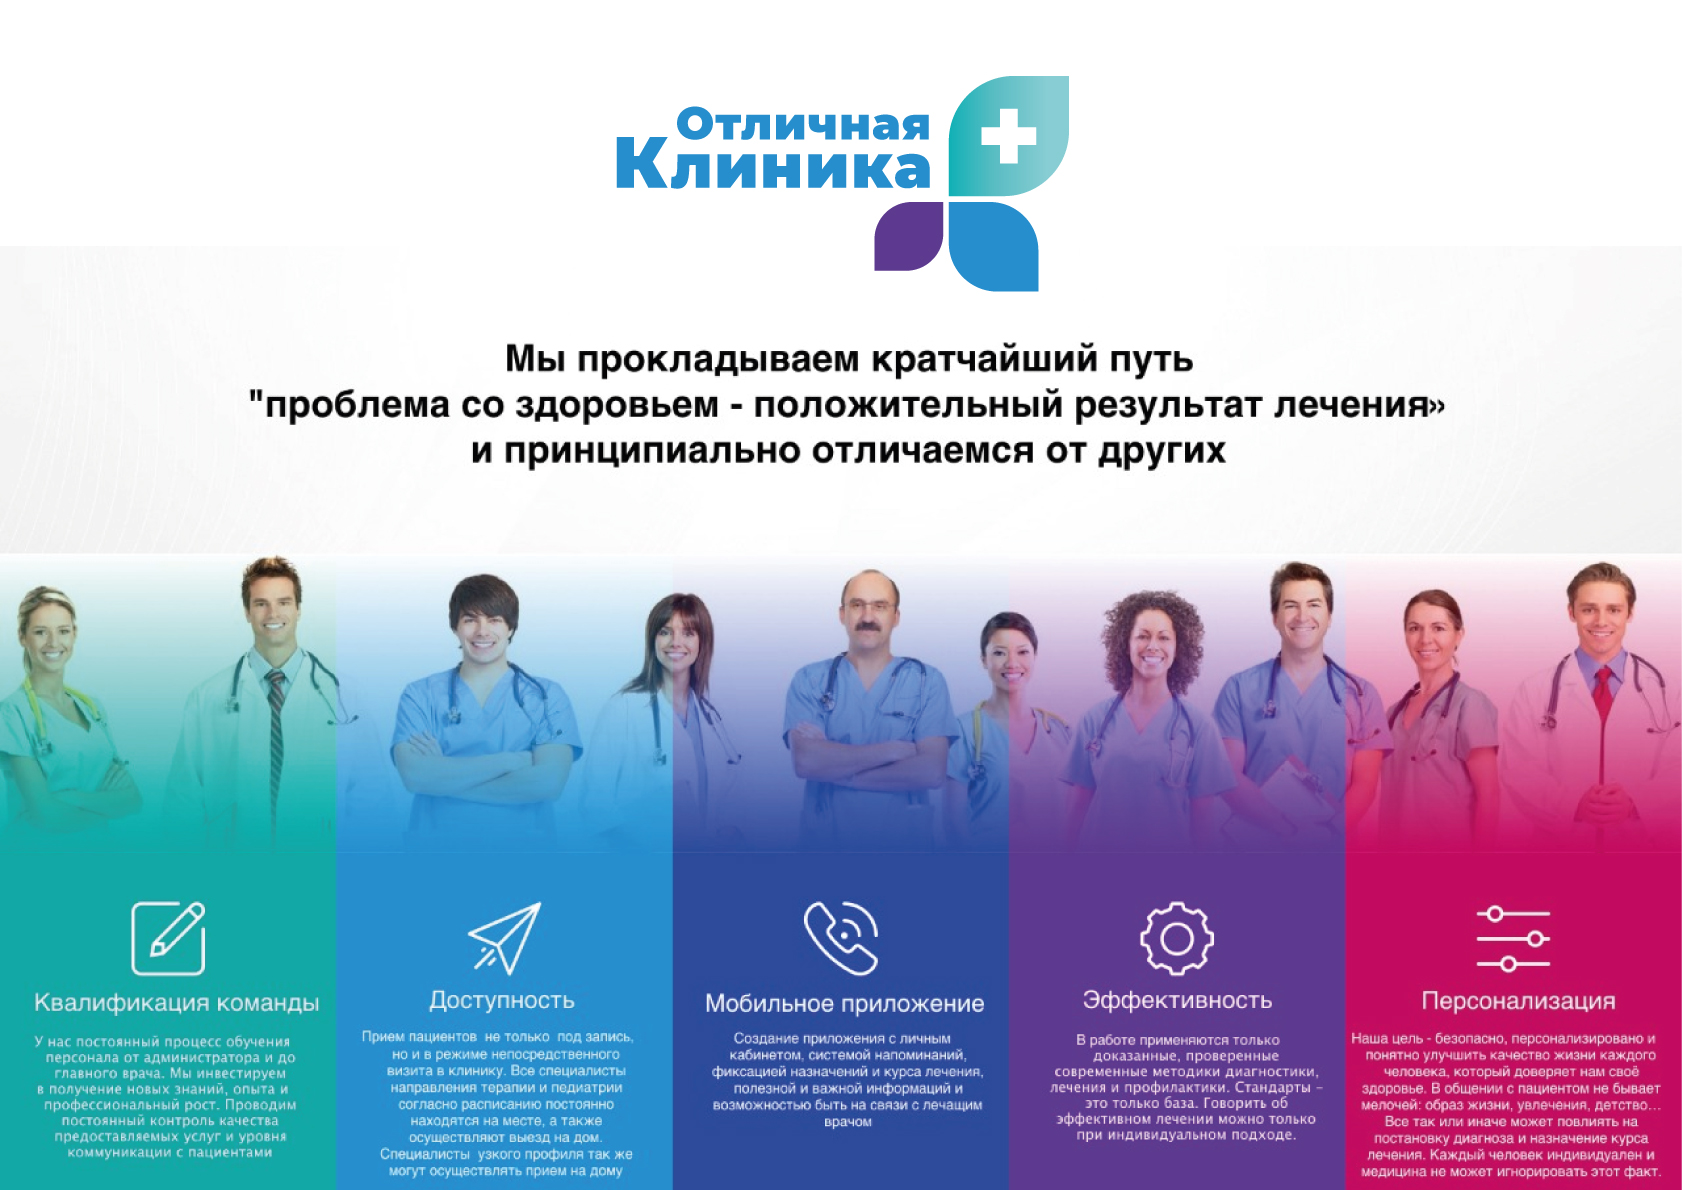 Логотип и фирменный стиль частной клиники фото f_4325c8e41e6b9547.jpg